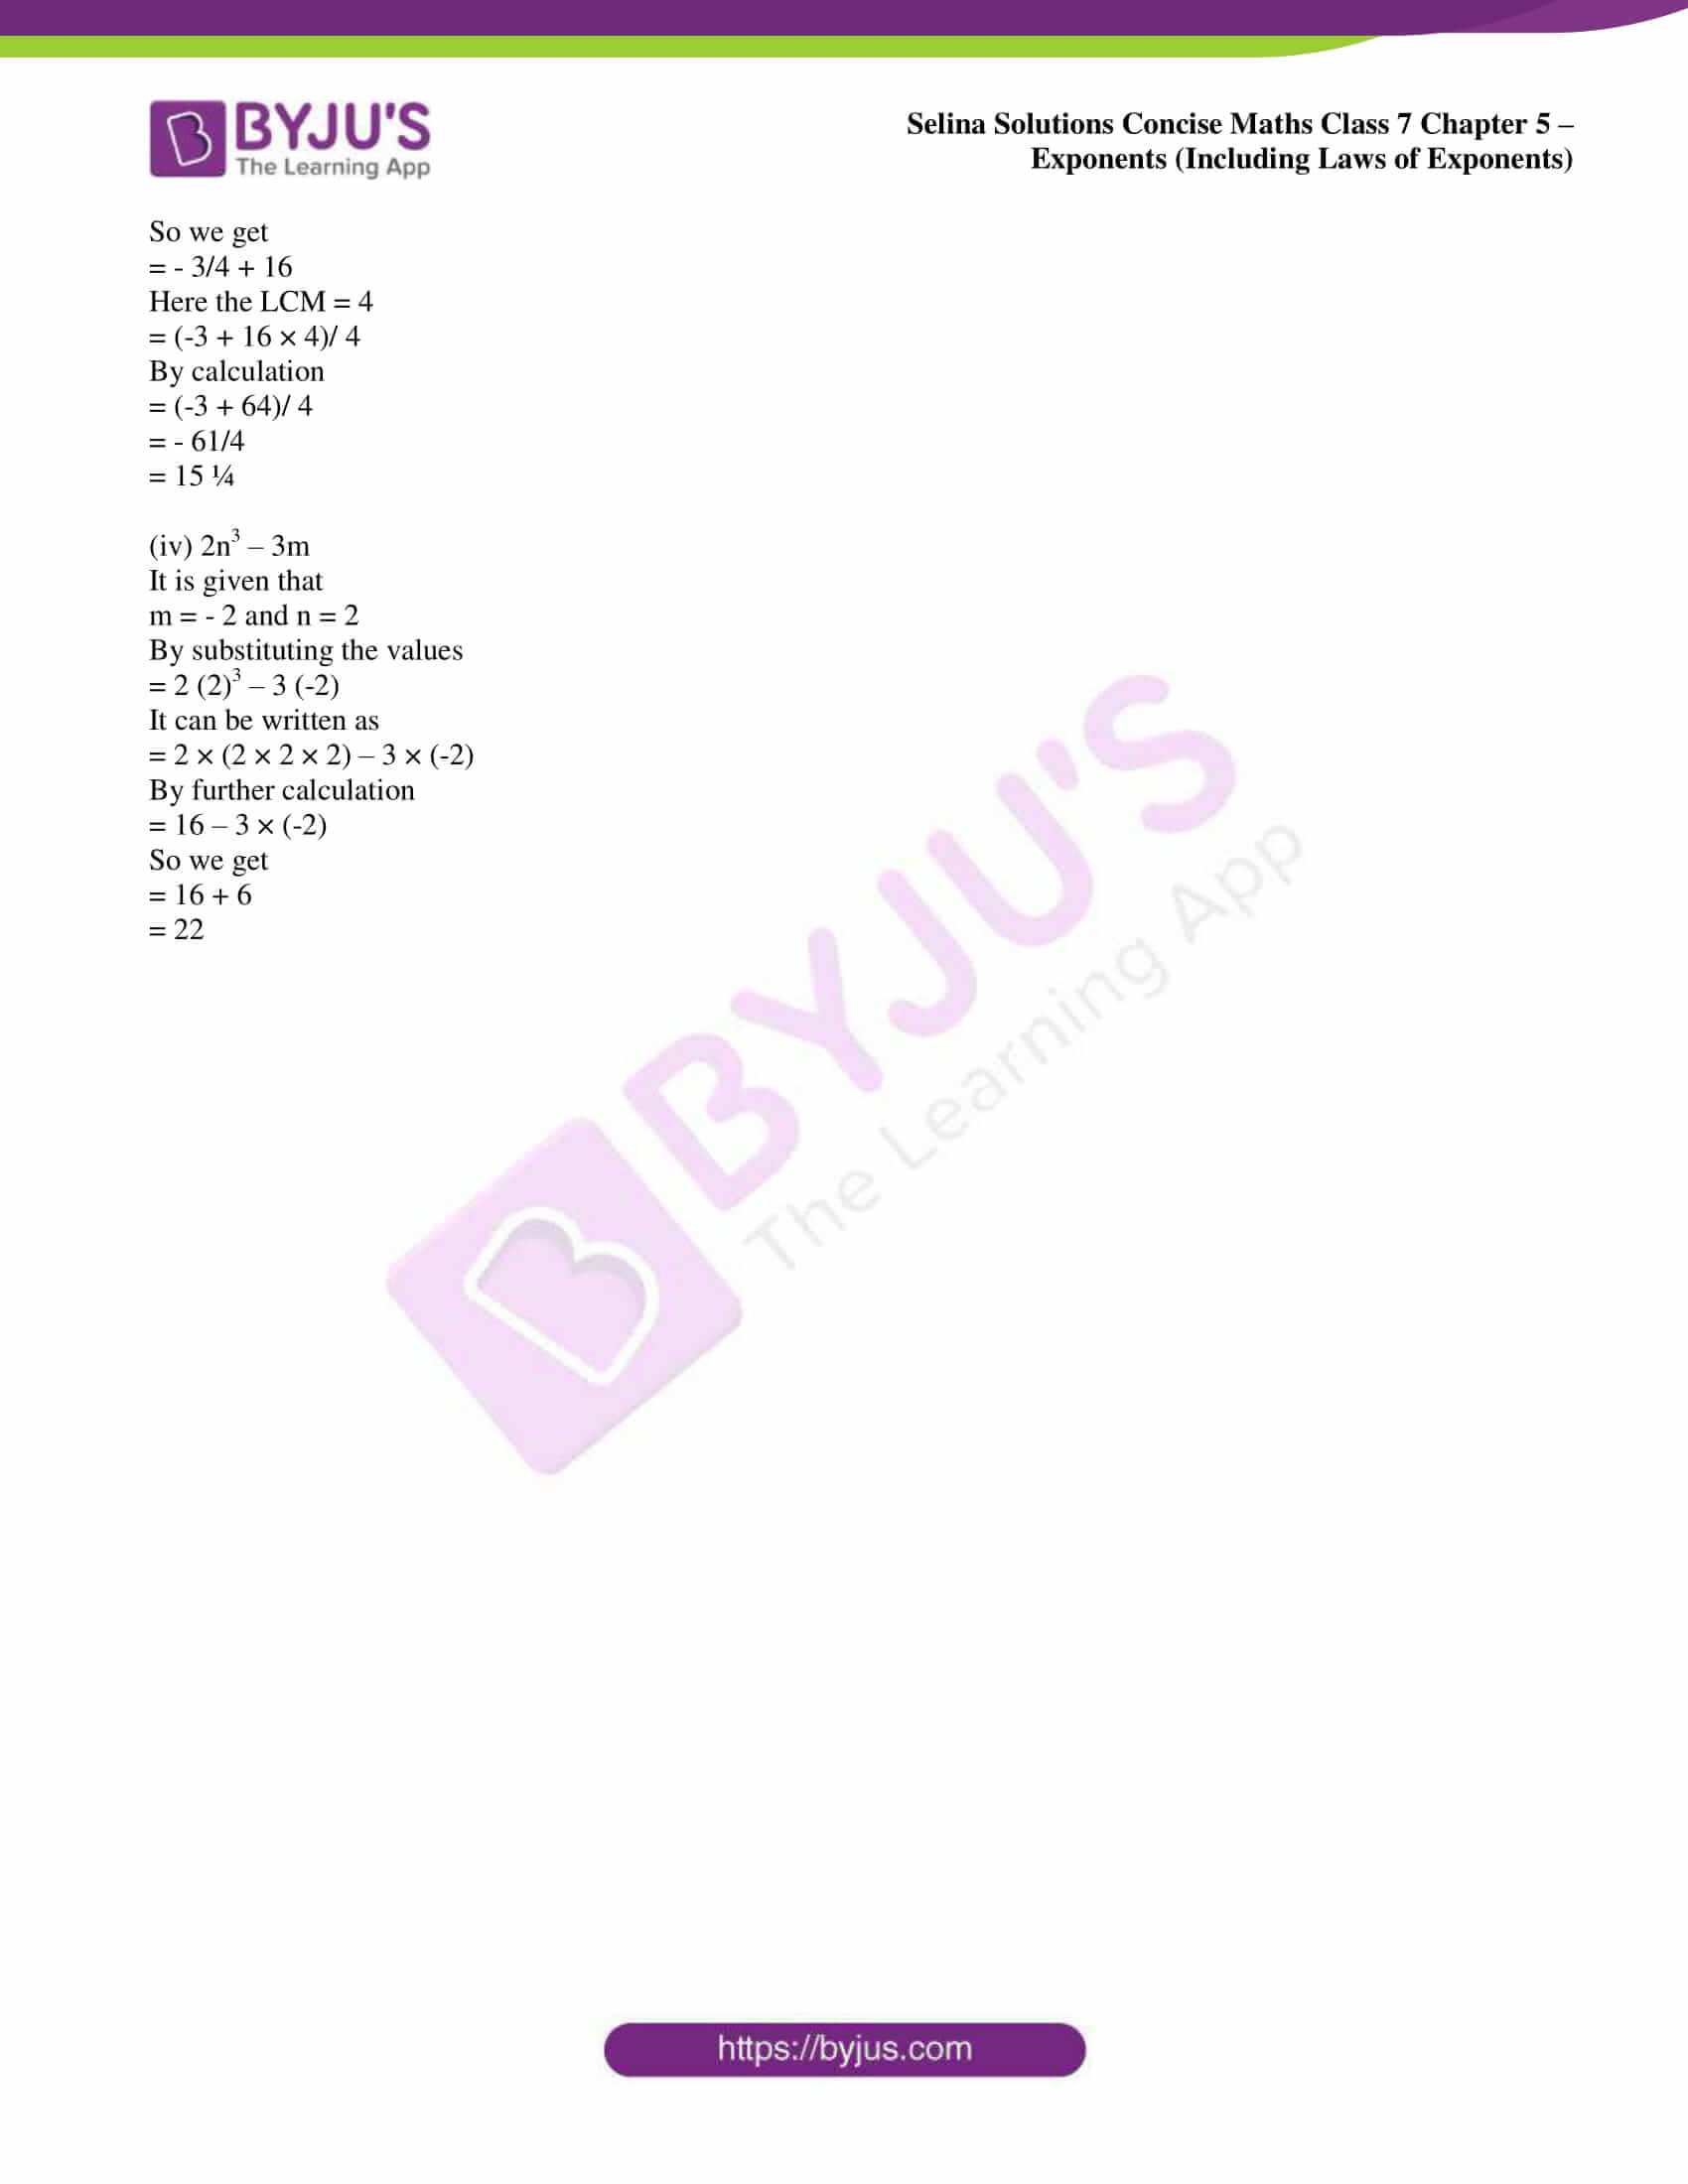 selina sol concise maths class 7 ch5 ex 5b 15